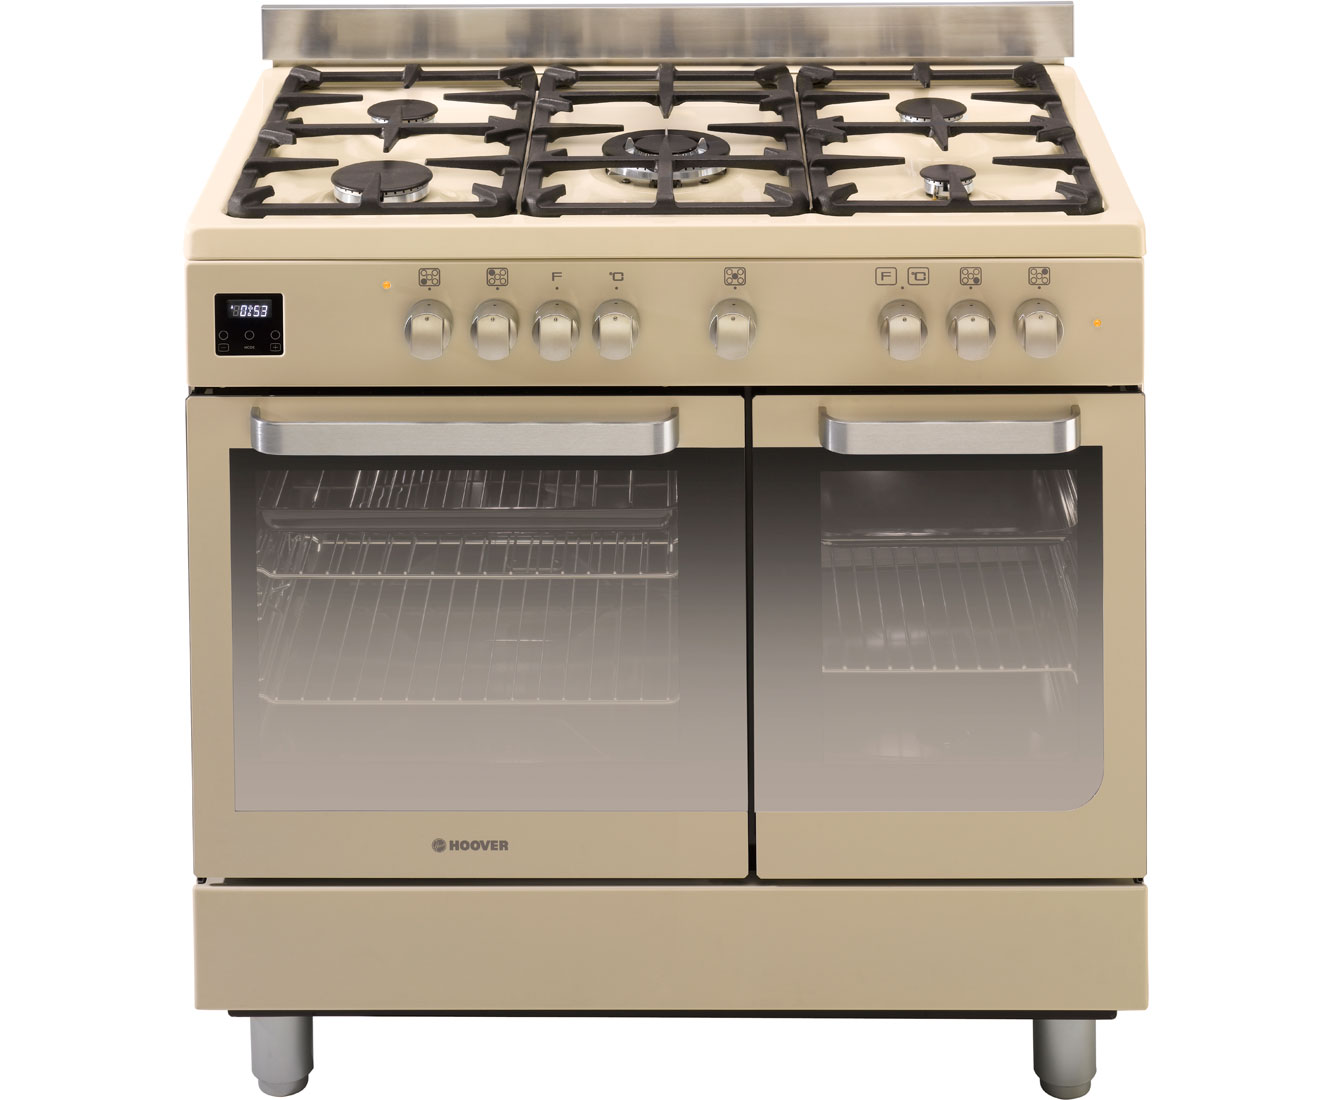 Uncategorized Argos Kitchen Appliances Sale shallow depth buy russell hobbs rh55ffwd180ss fridge freezer argos hoover hgd9395iv 90cm dual fuel range cooker ivory kitchen appliances